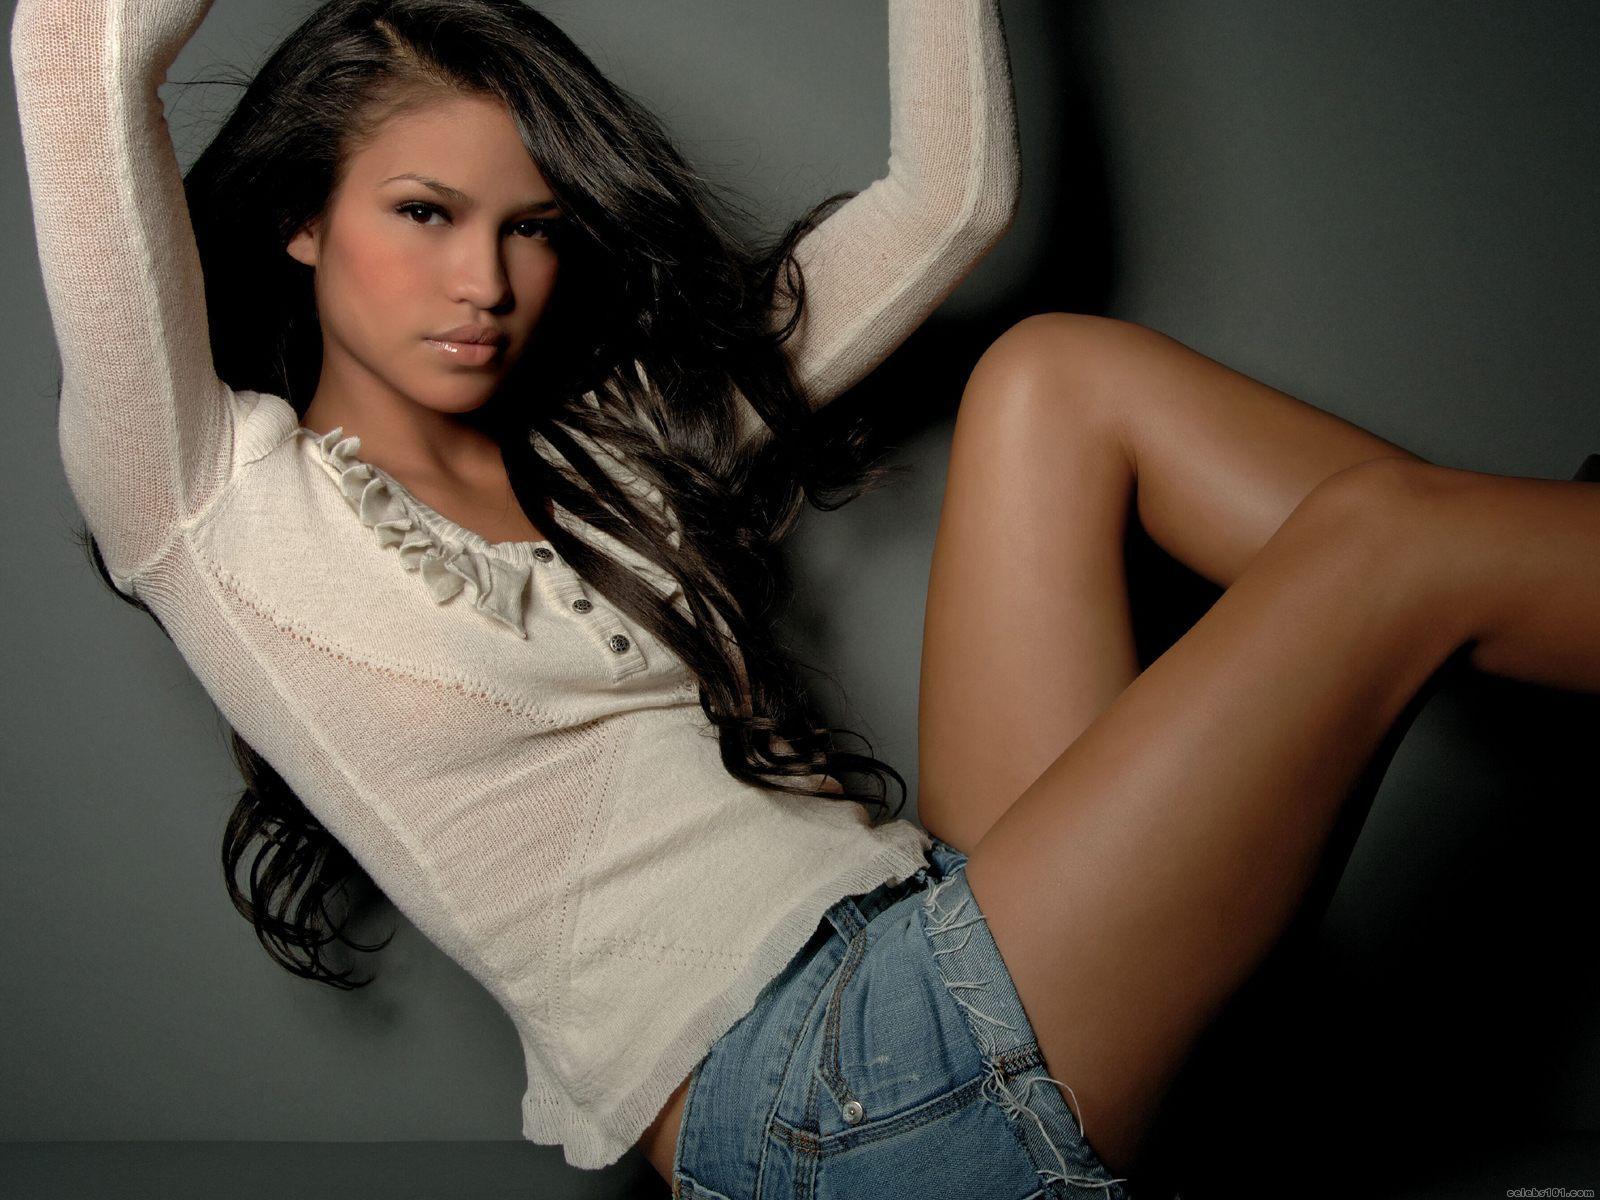 Cassie Ventura singer actress women females girls models brunettes sexy babes face eyes pov f ...